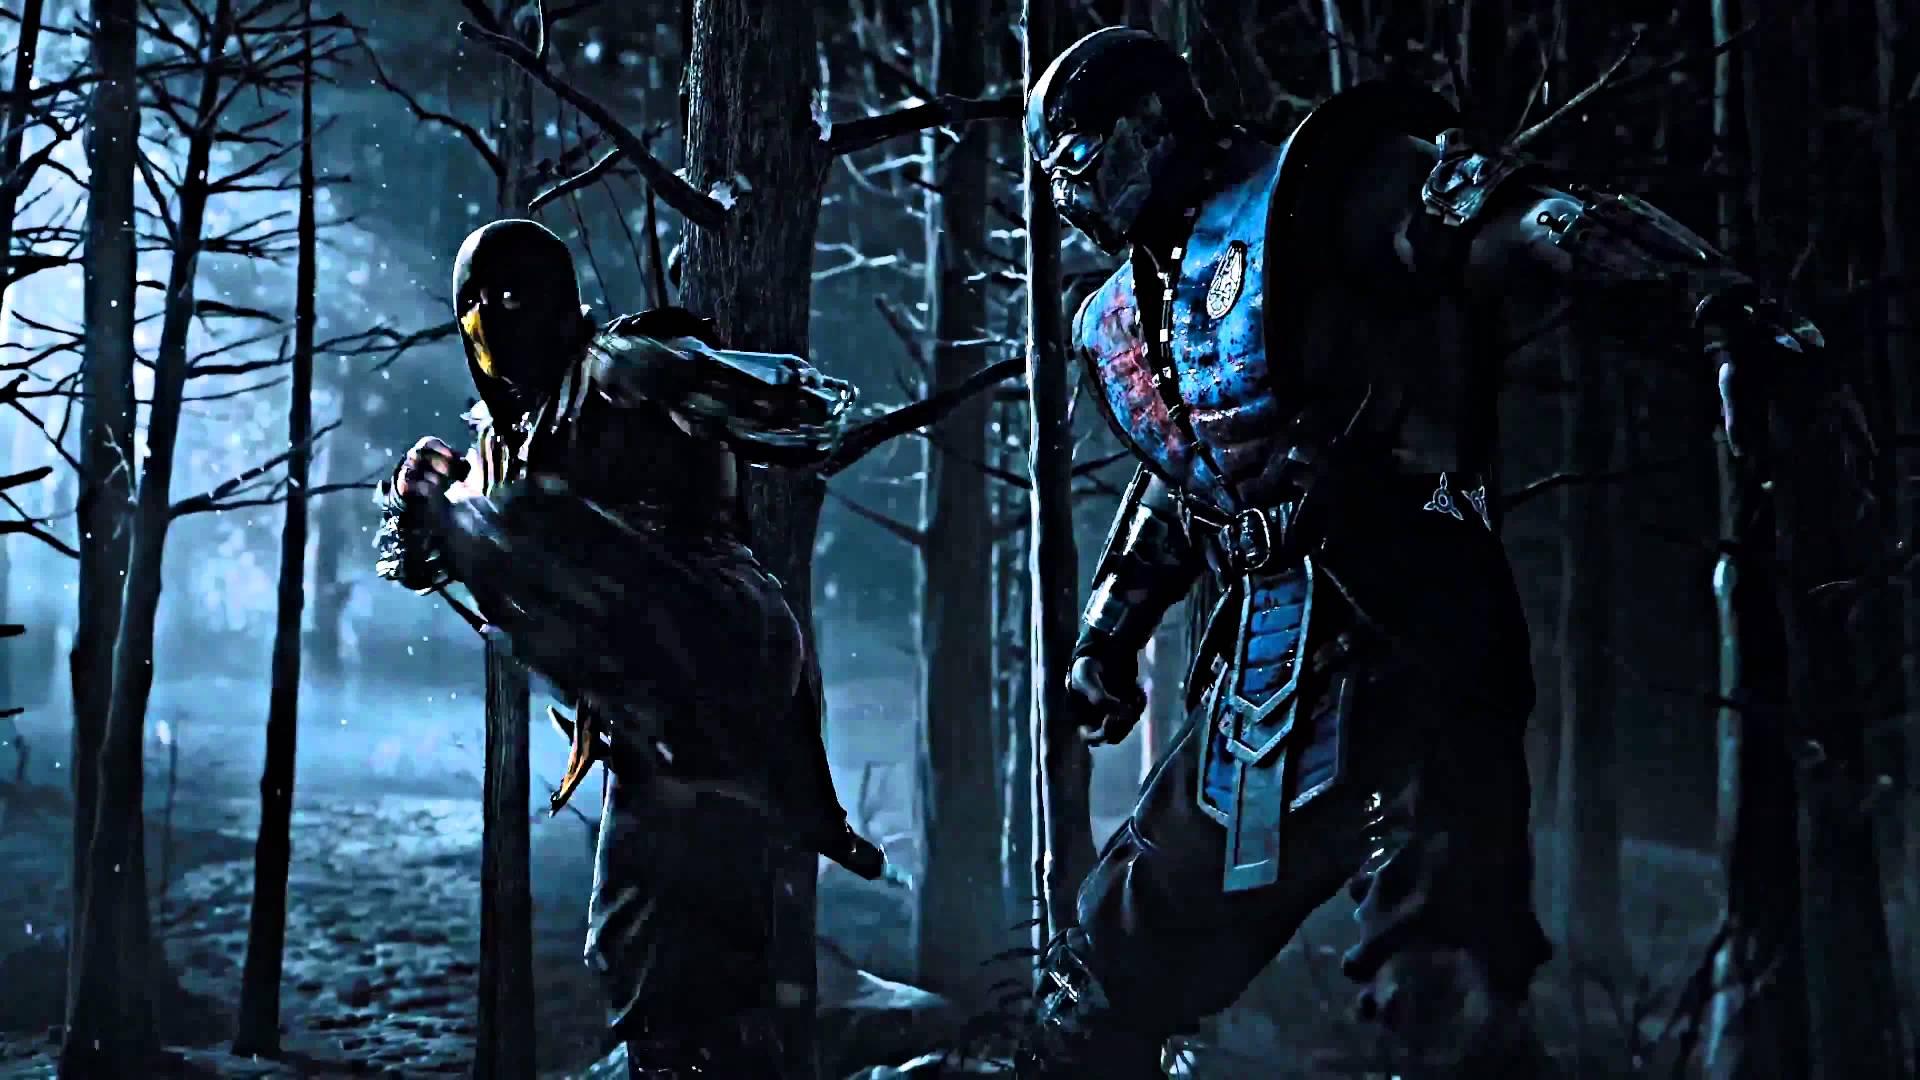 4K Mortal Kombat Wallpapers - Top Free 4K Mortal Kombat